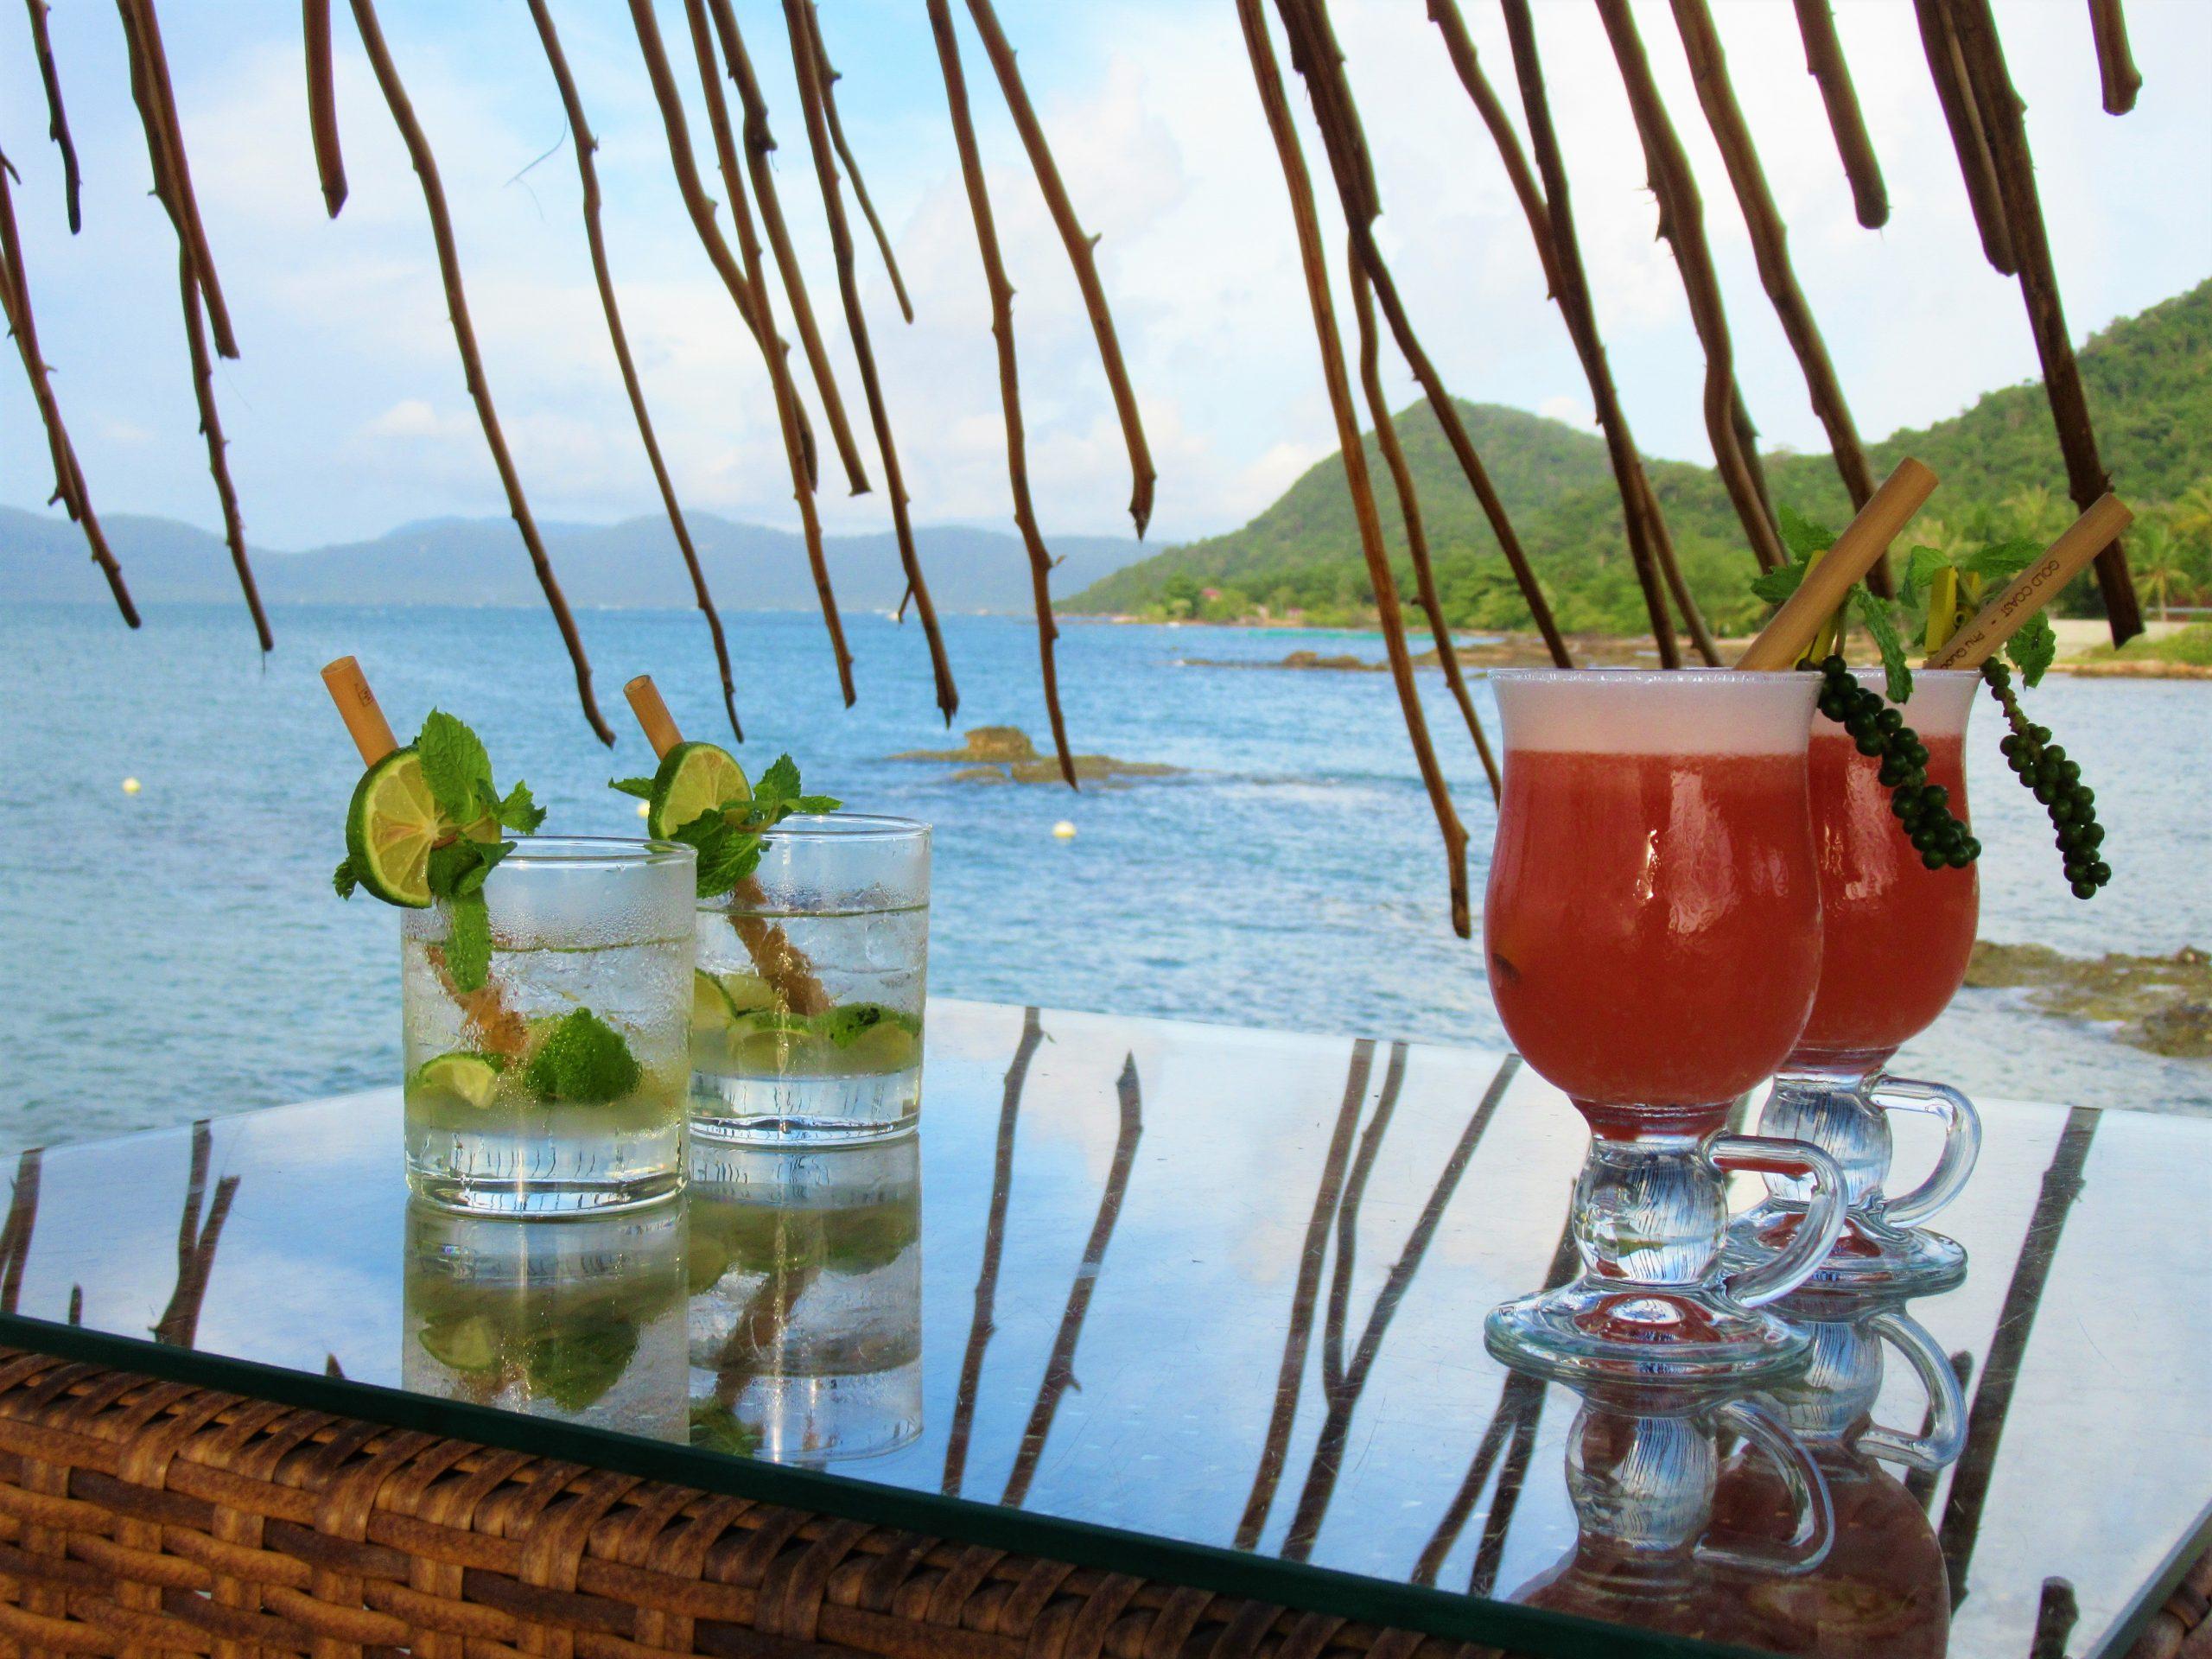 Cocktails at happy hour, Gold Coast Resort, Phu Quoc Island, Vietnam